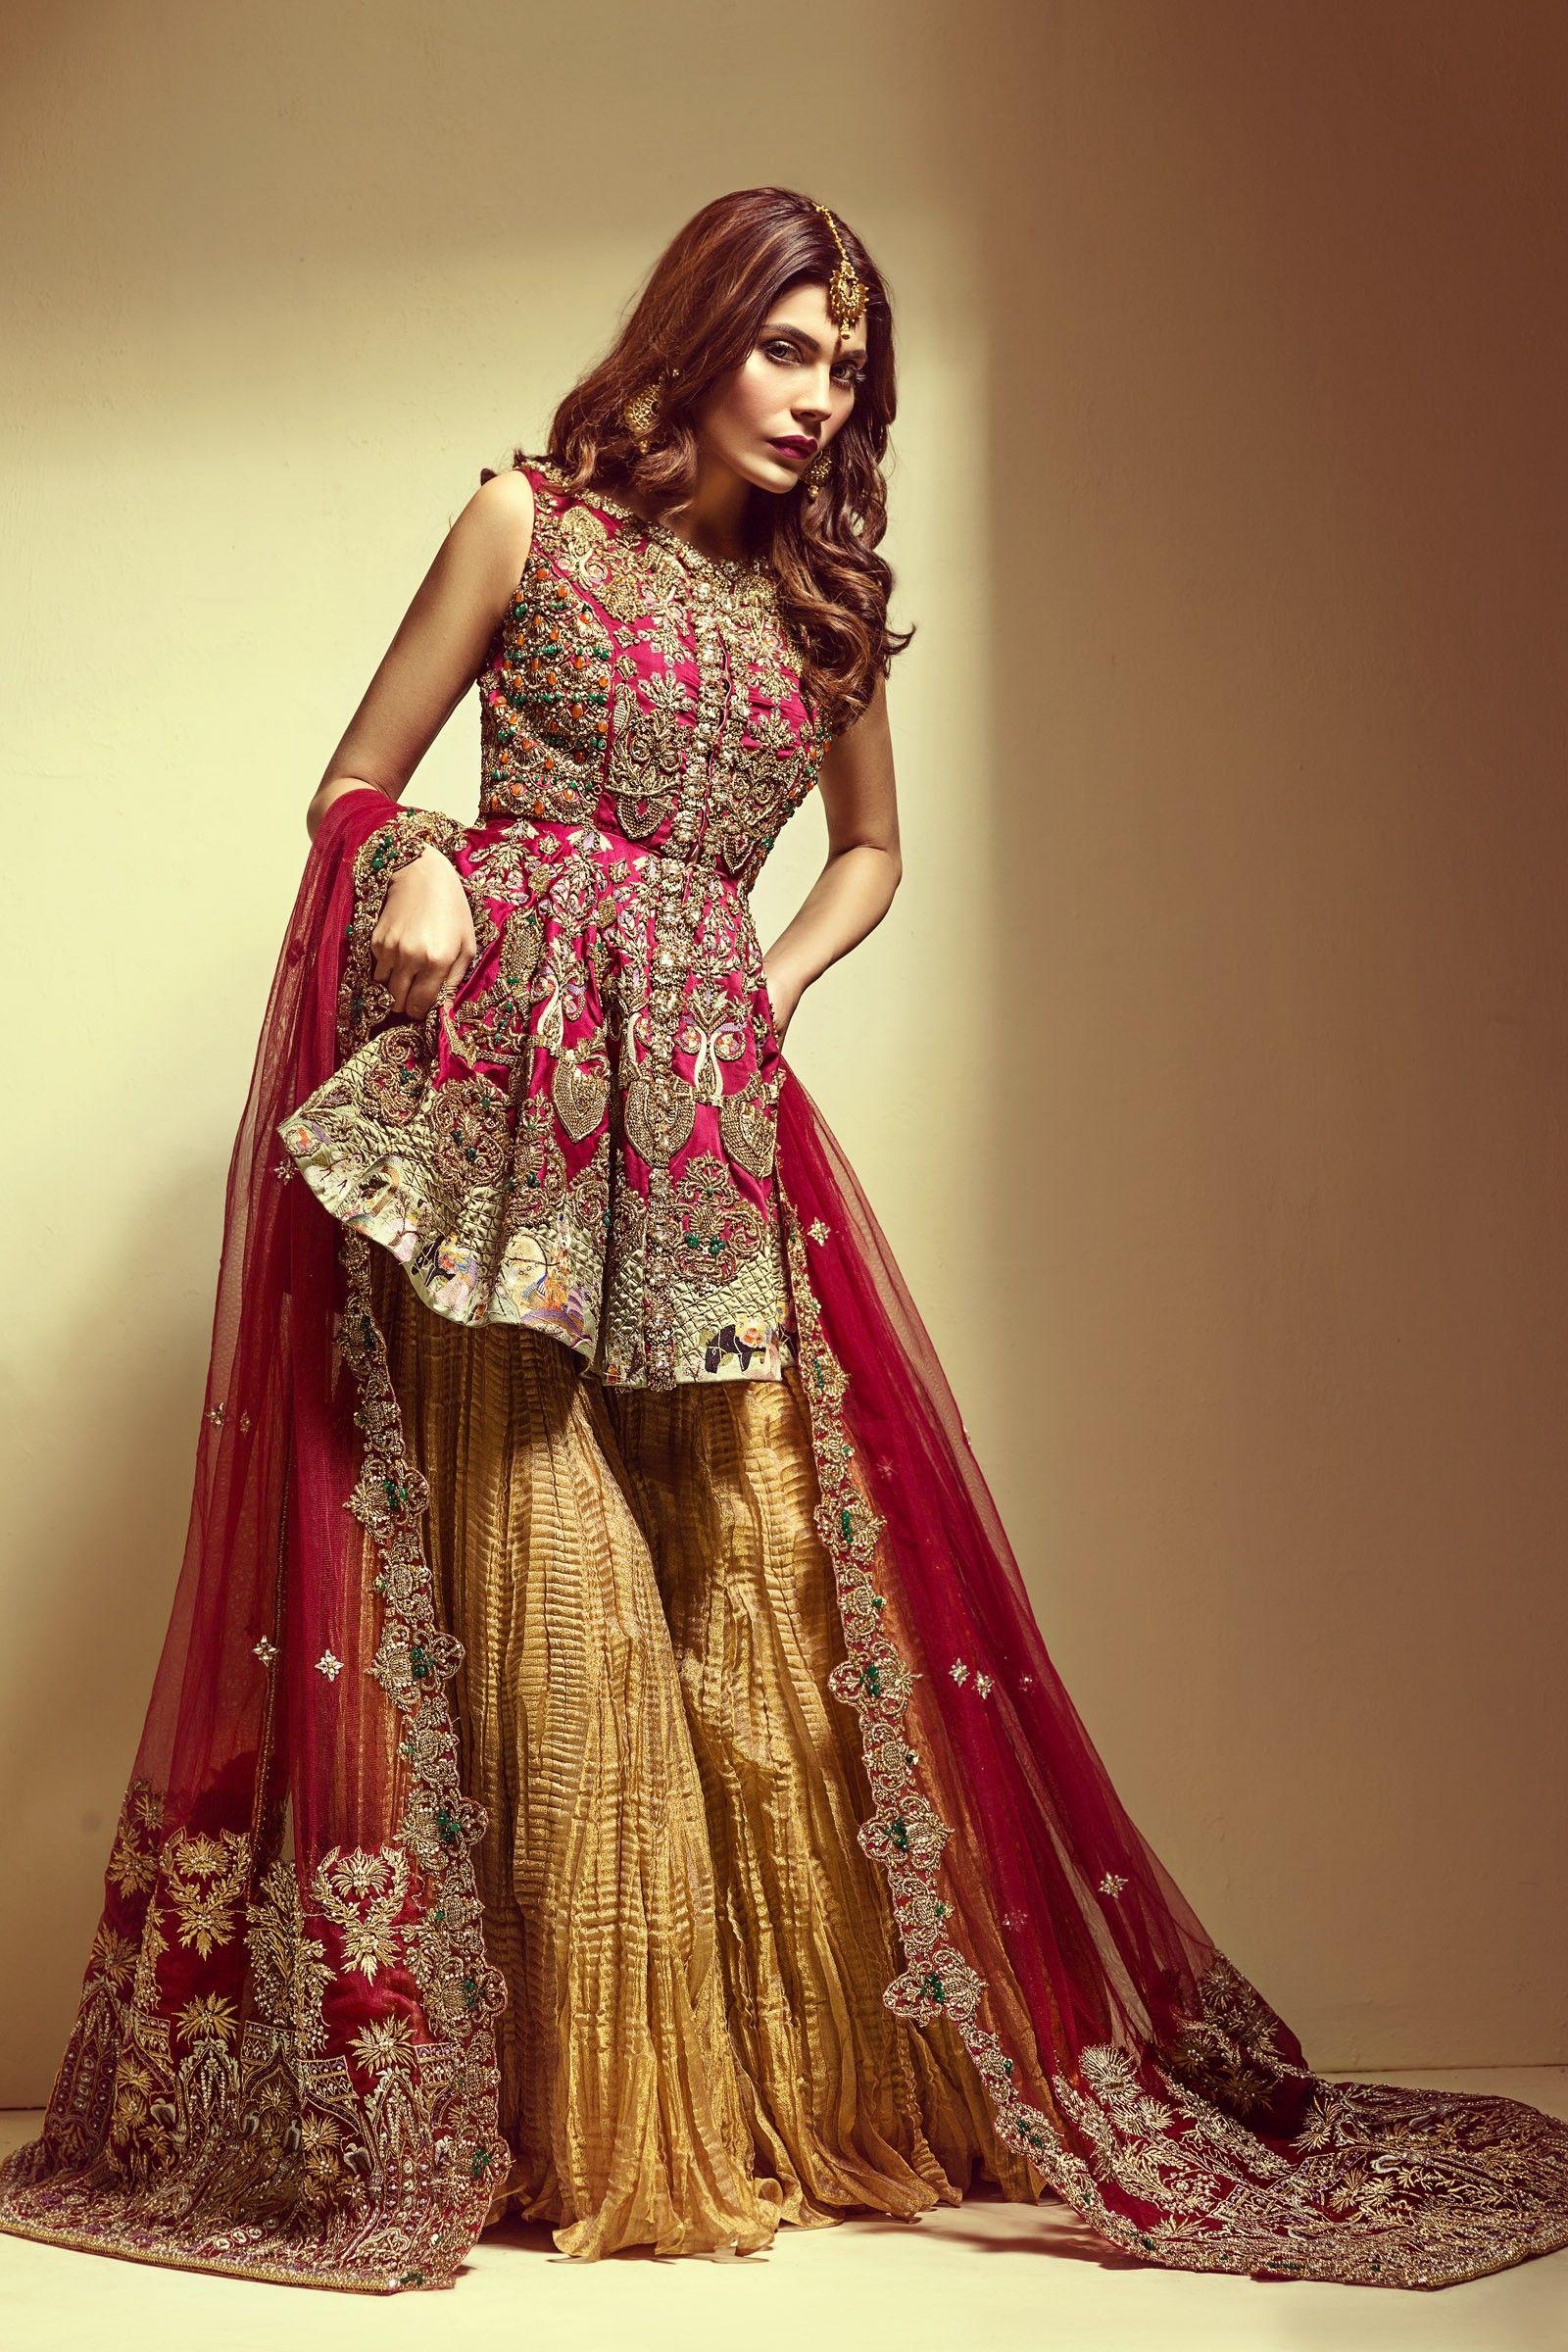 94ad099506 Avp-14 in 2019 | Photo | Bridal mehndi dresses, Dresses, Bridal dresses